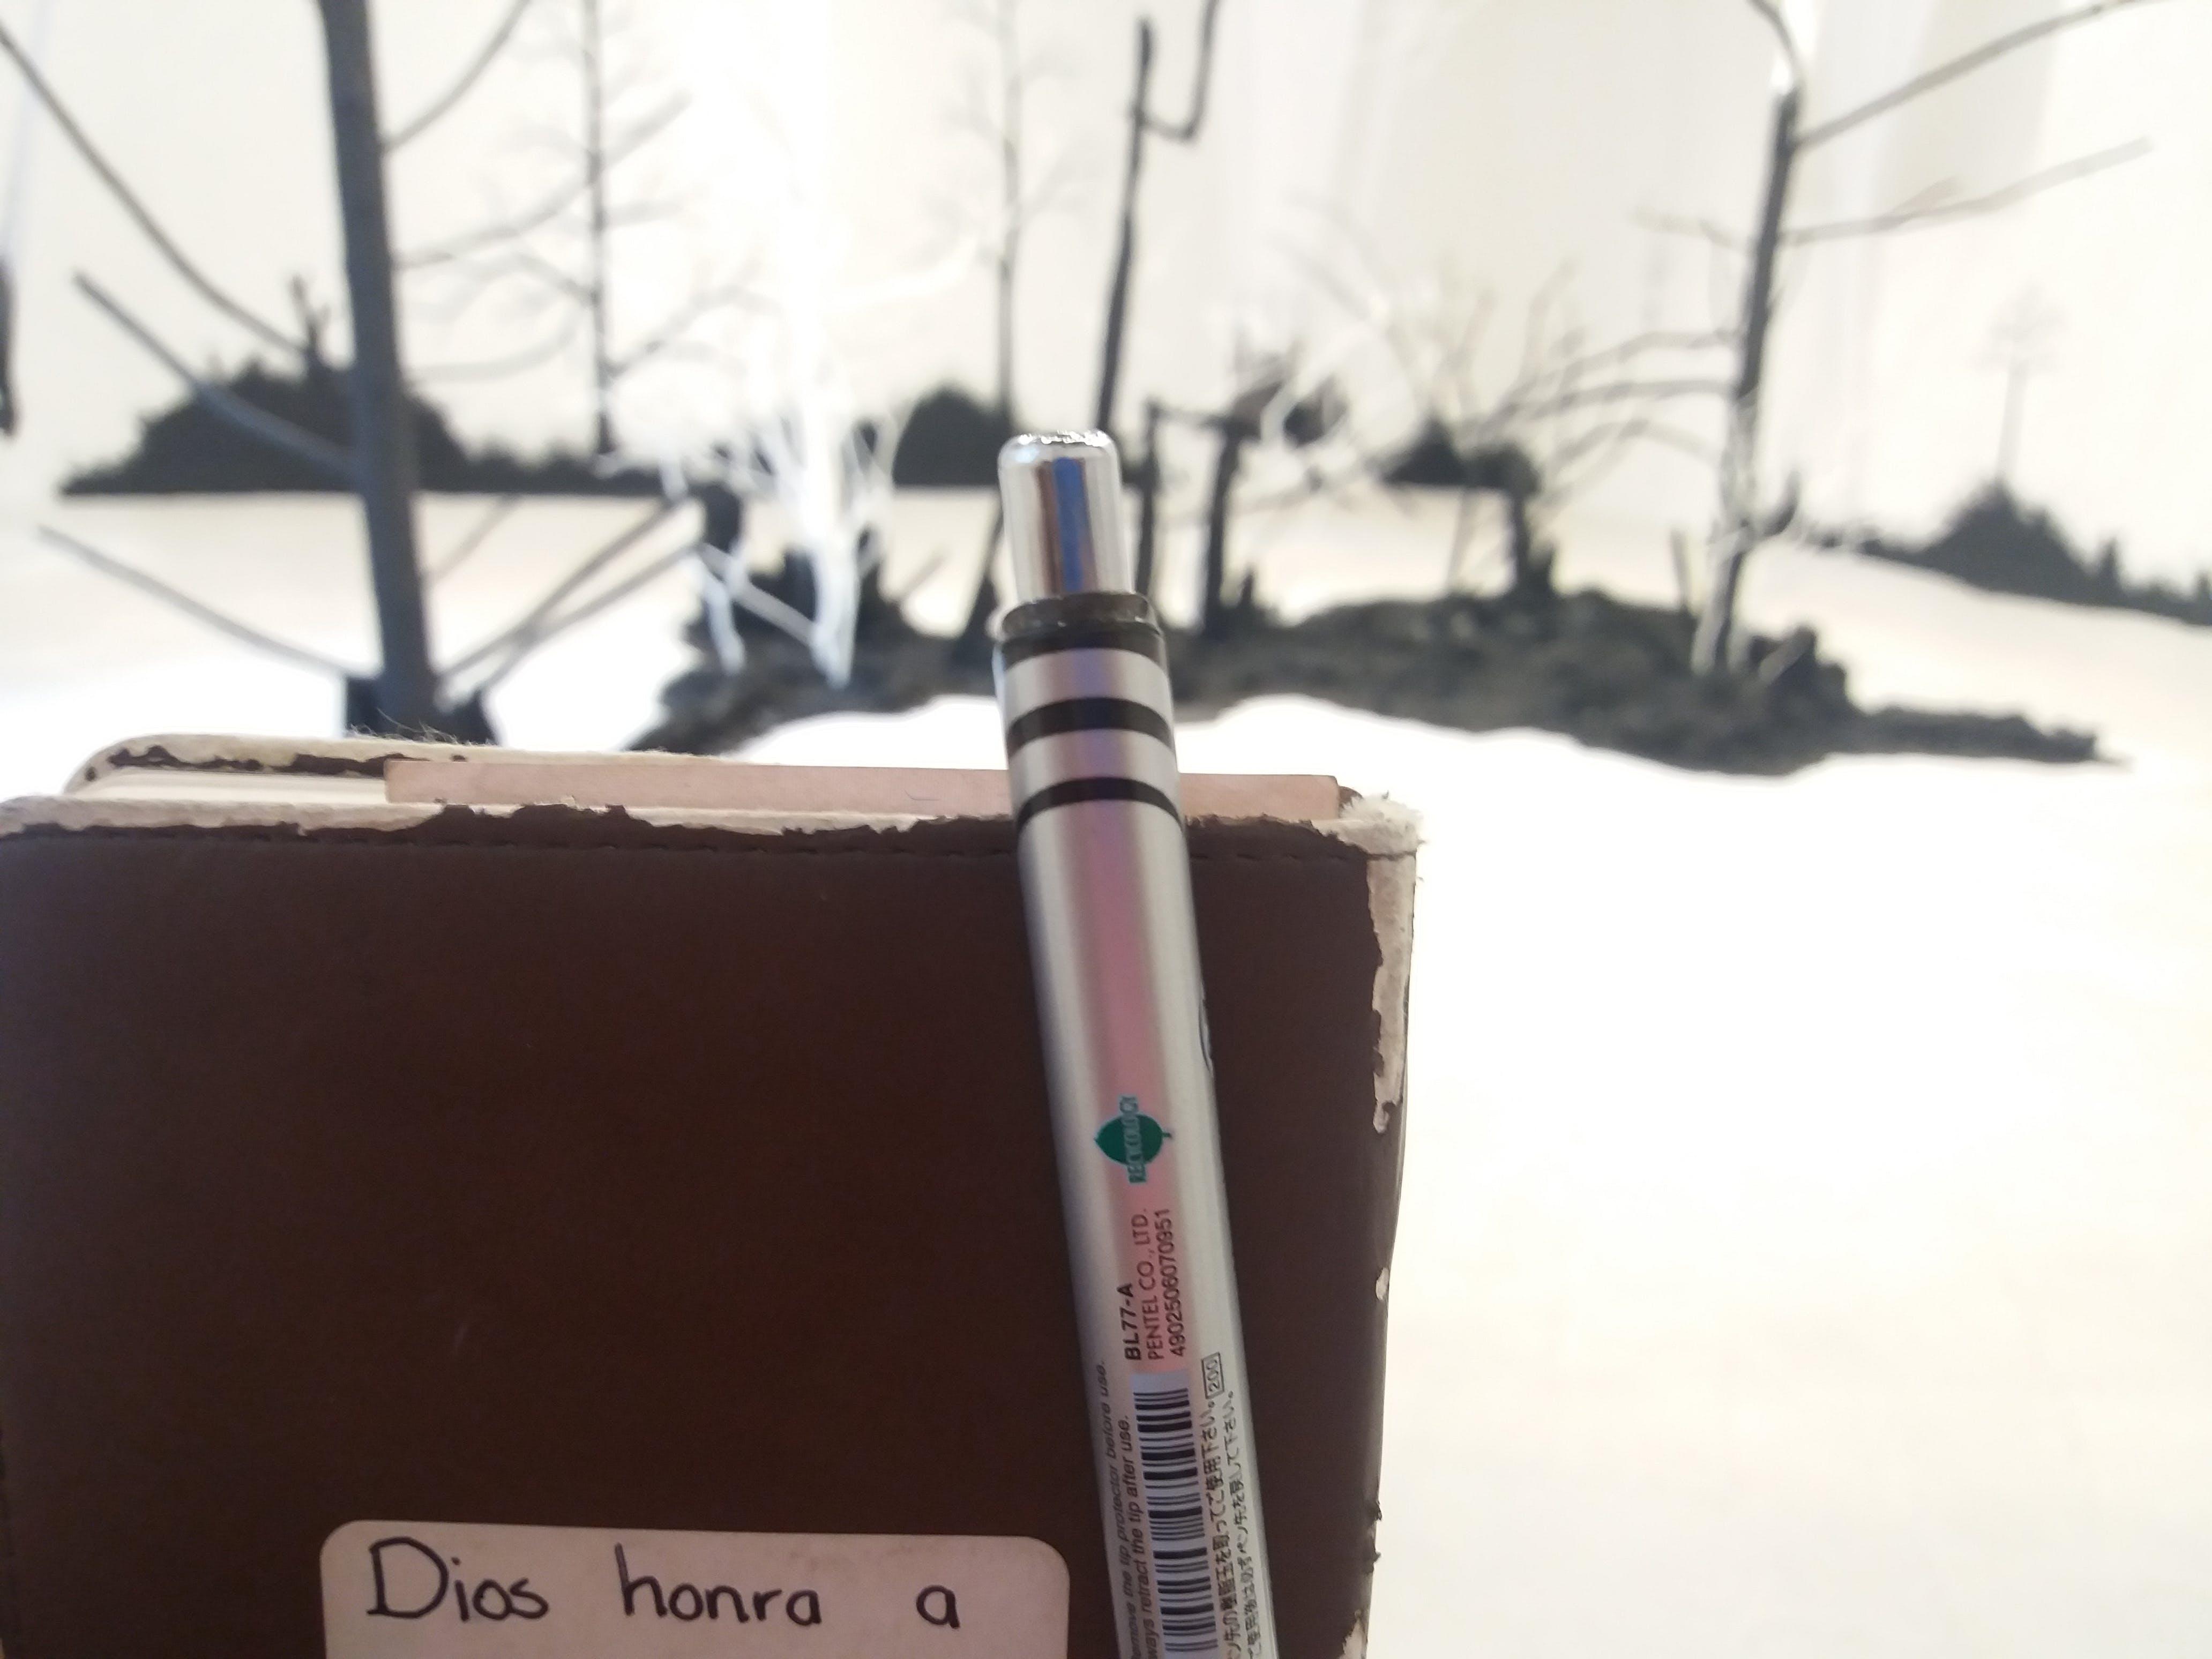 art museum, pencil, trees